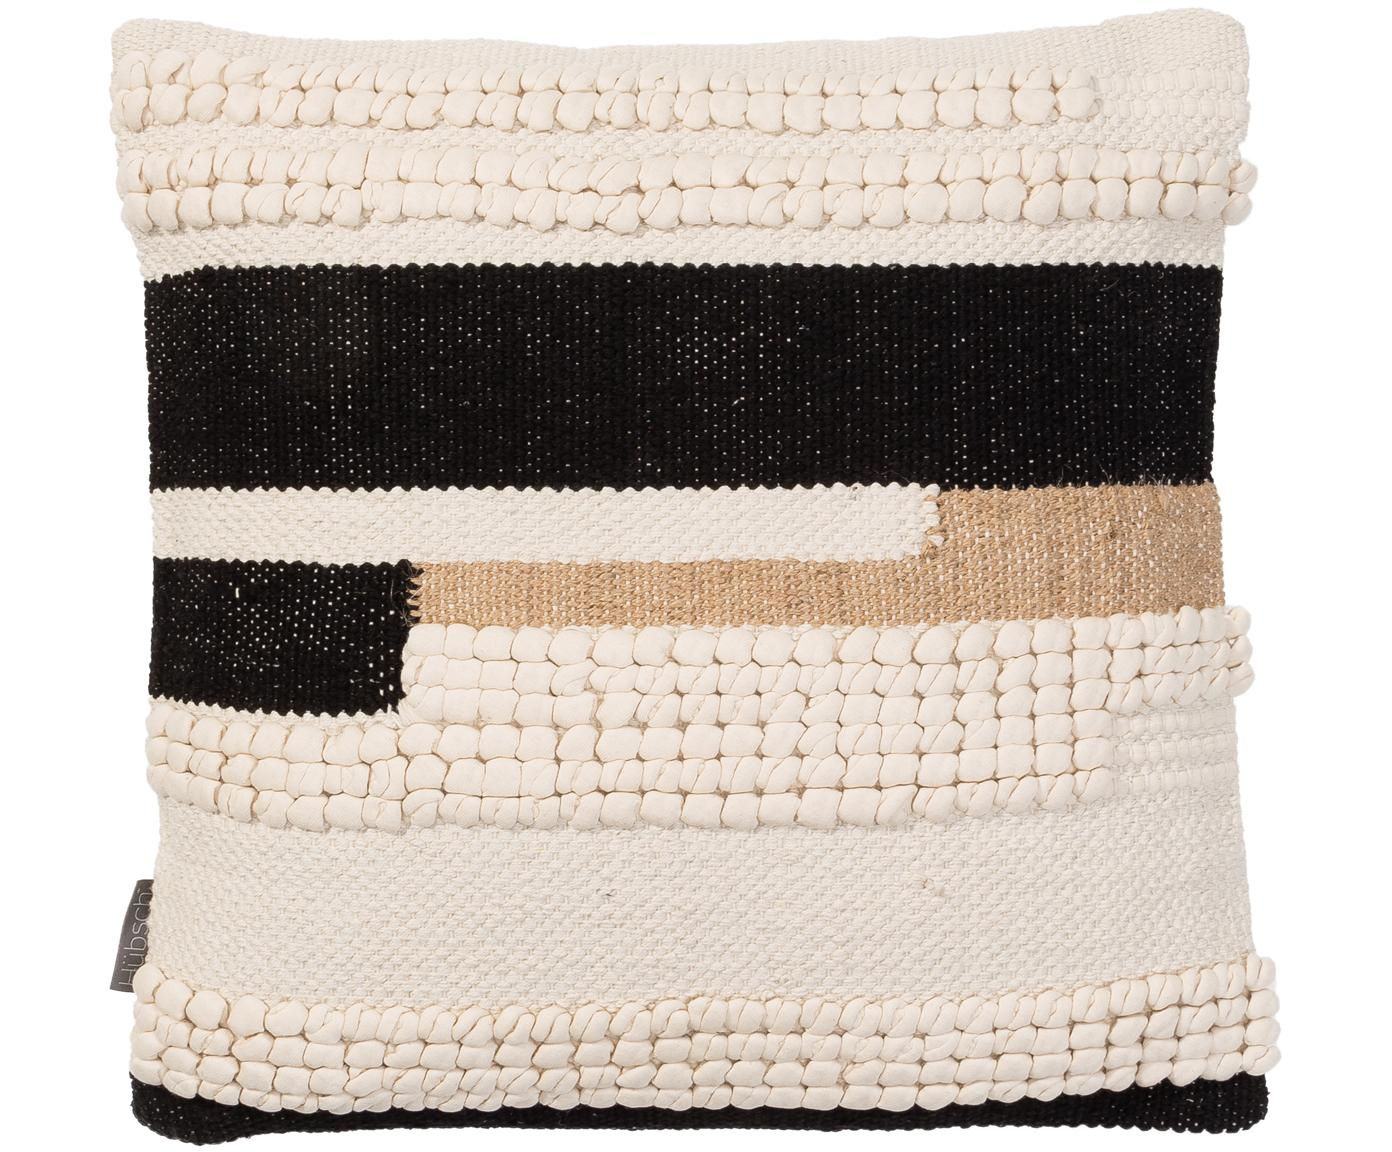 Kussenhoes Winti, 95% katoen, 5% polyester, Crèmekleurig, zwart, lichtbruin, 45 x 45 cm